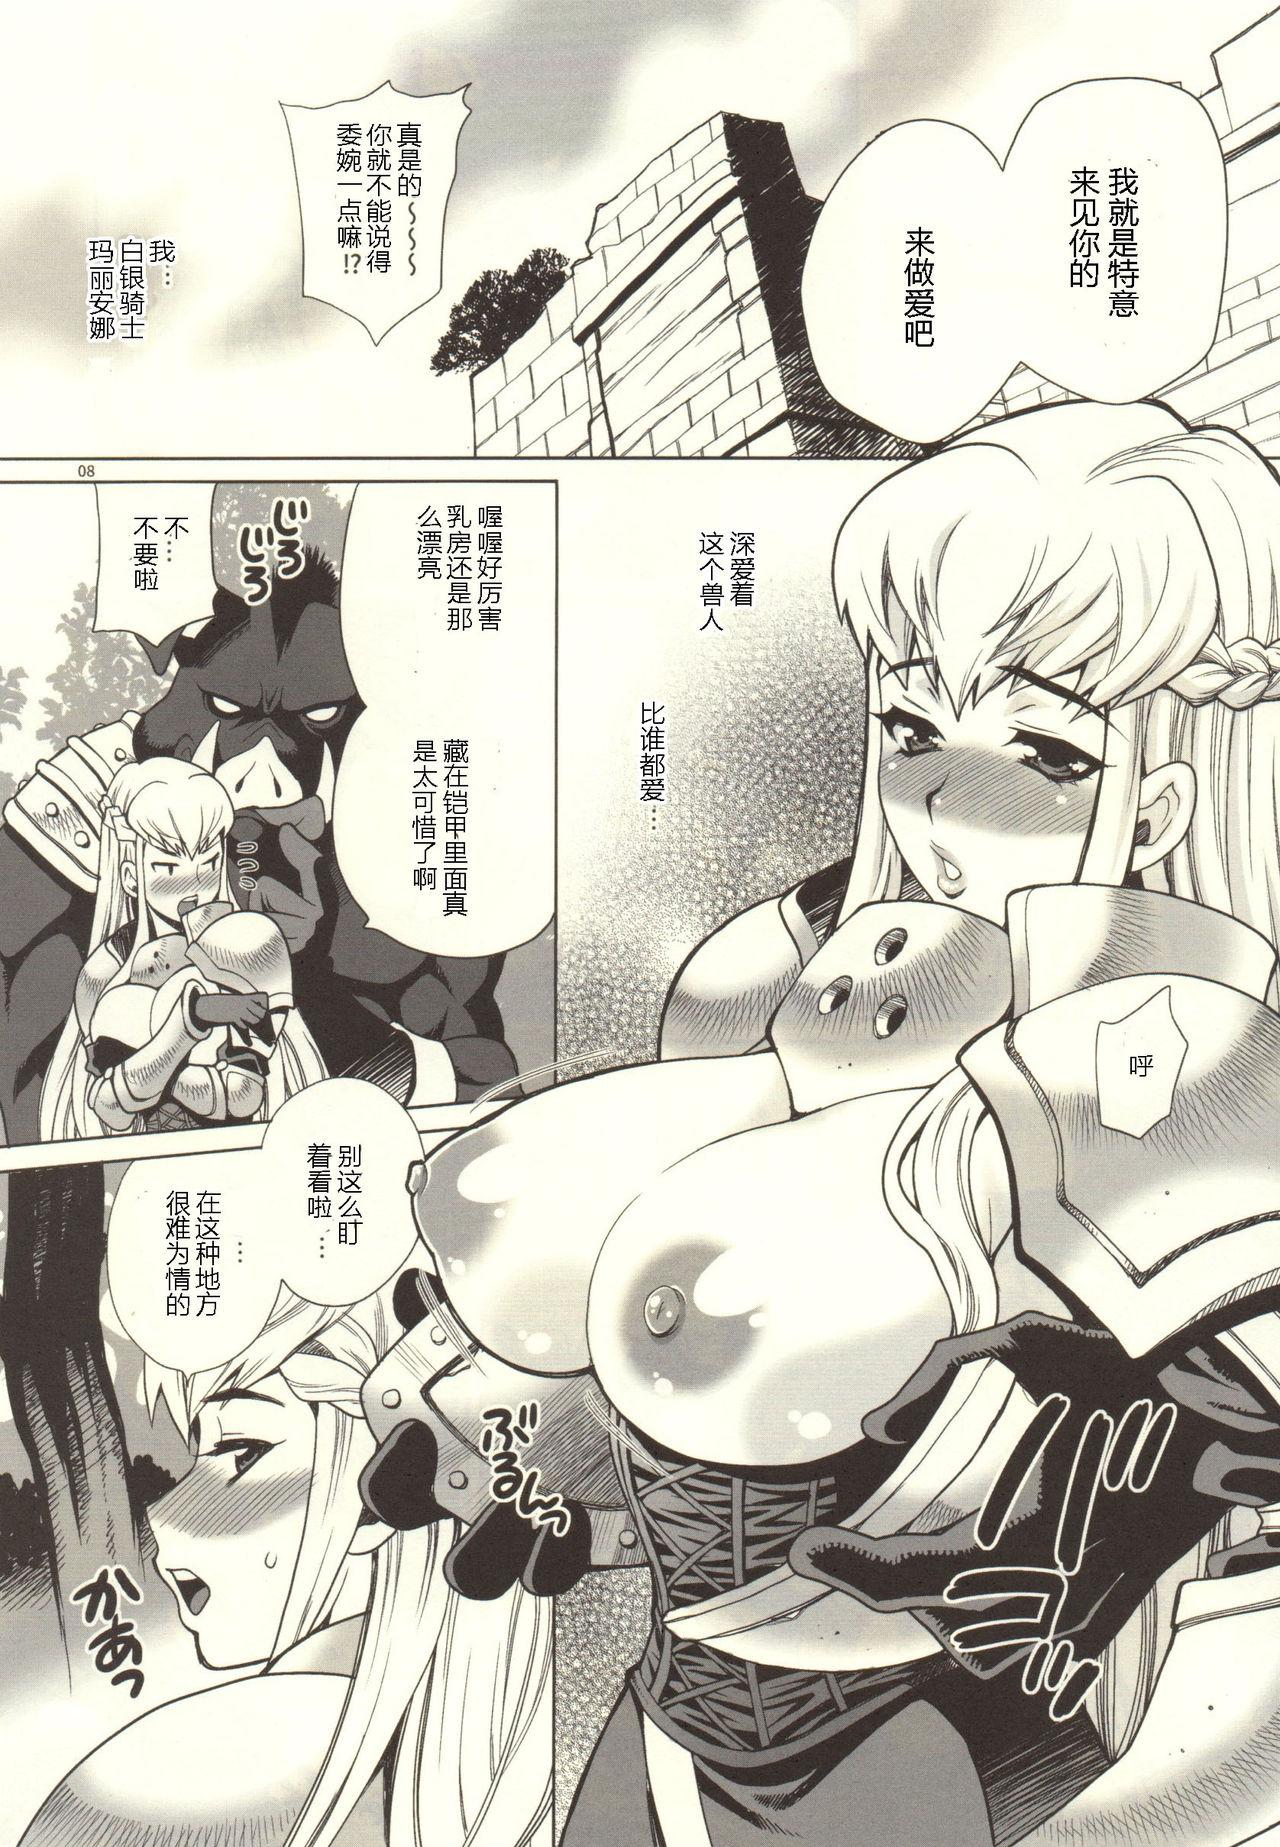 Yukiyanagi no Hon 37 Buta to Onnakishi - Lady knight in love with Orc 6